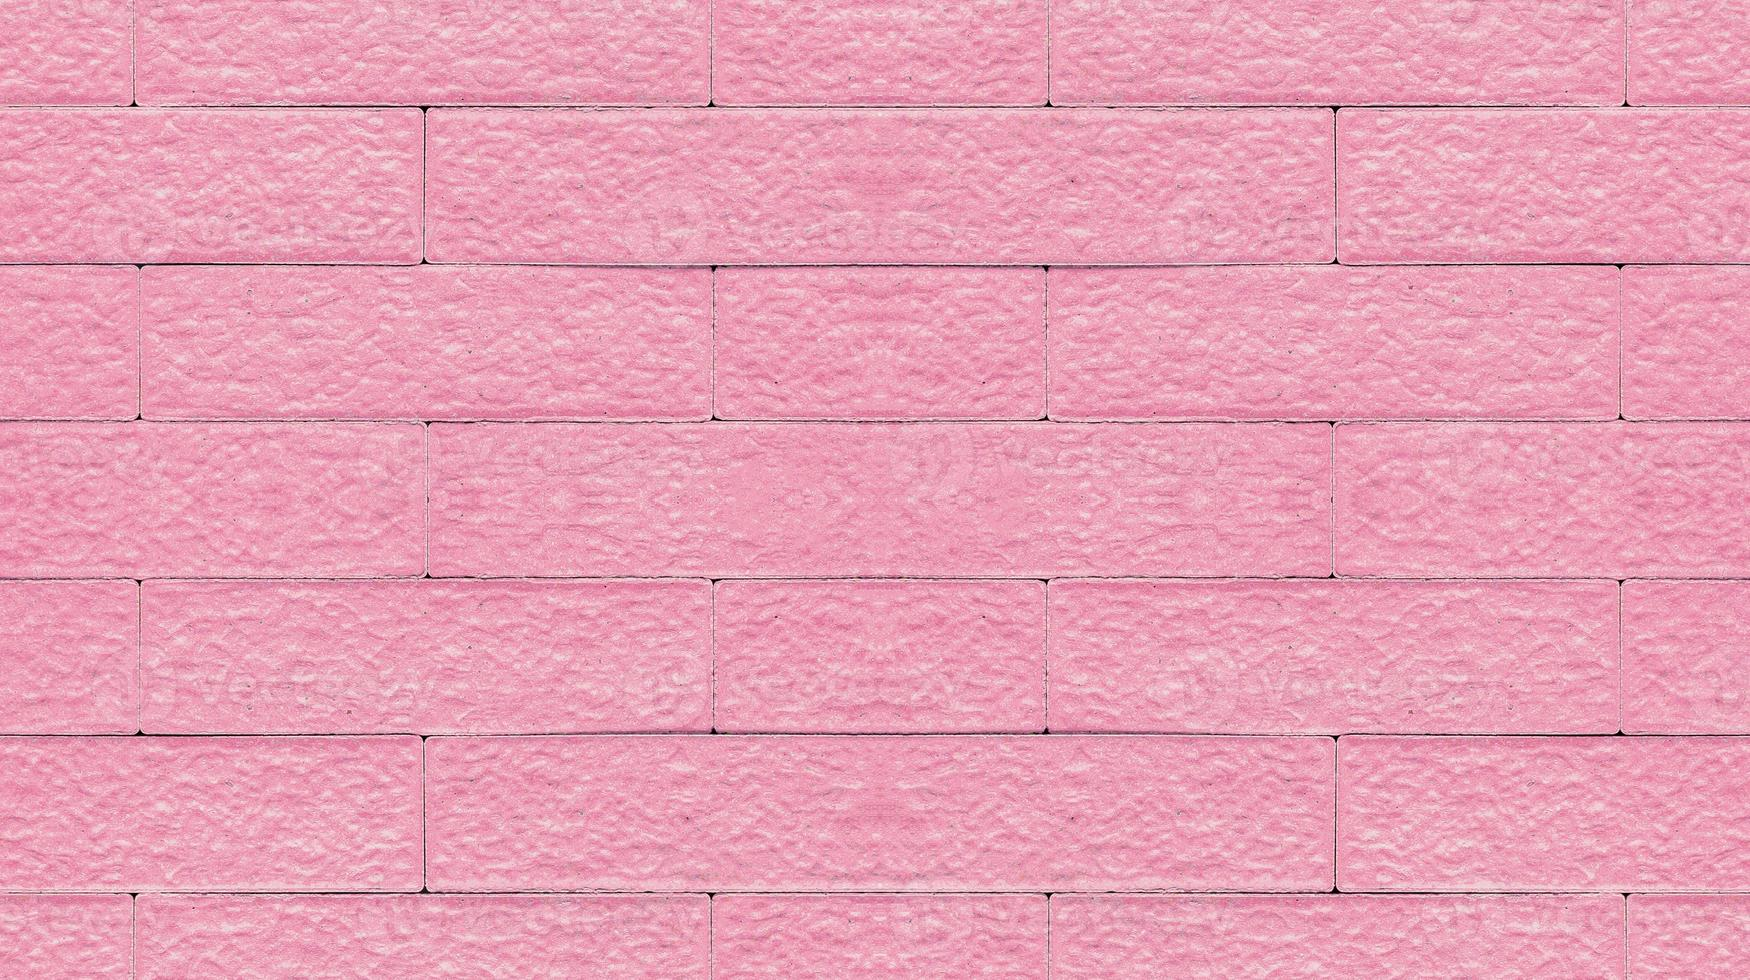 Textur des rosa Betonhintergrundes foto